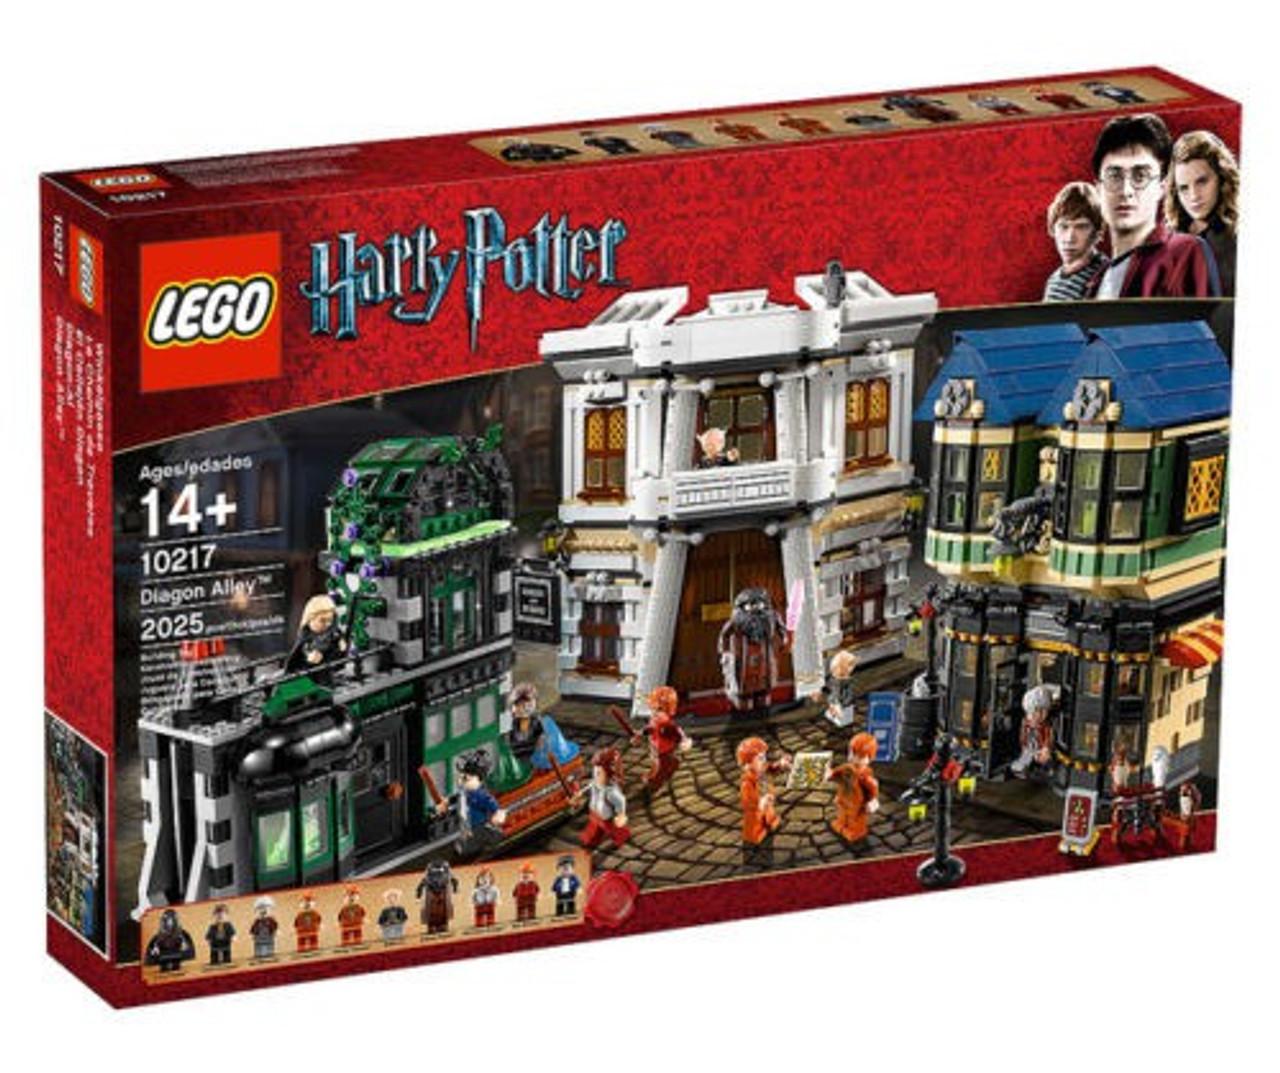 LEGO Harry Potter Series 2 Diagon Alley Exclusive Set